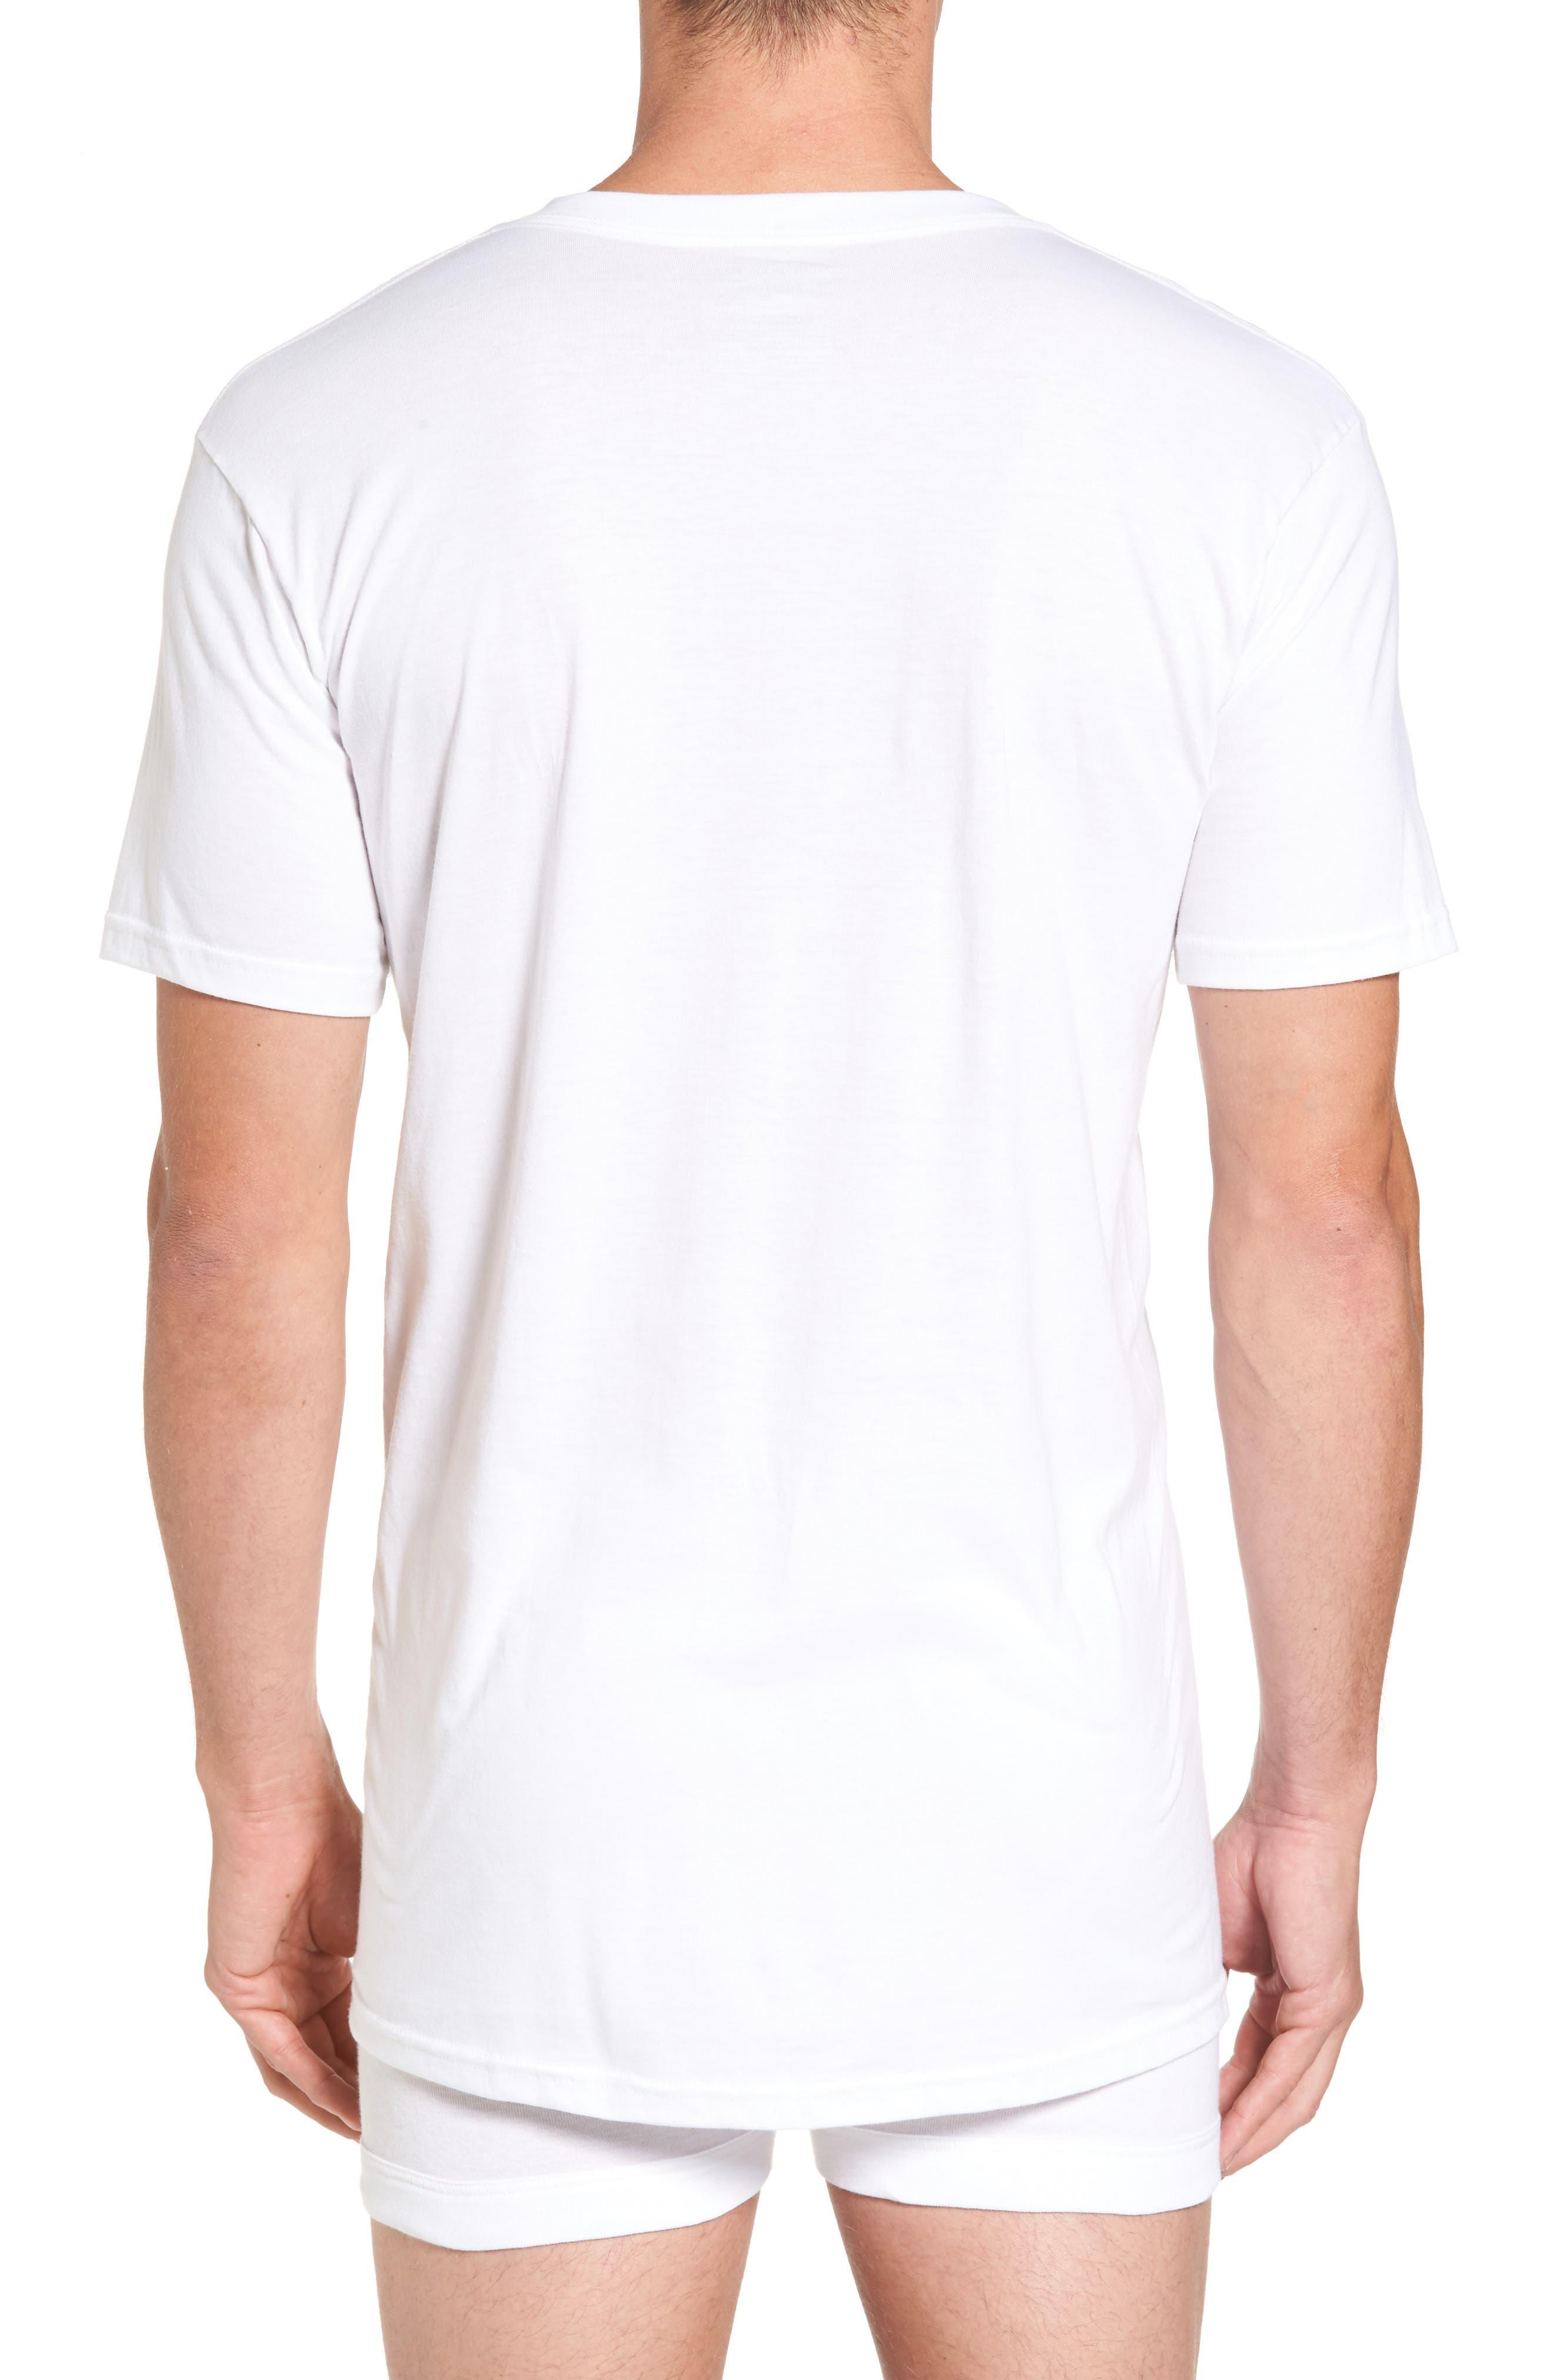 NORDSTROM MEN'S SHOP, 4-Pack Regular Fit Supima<sup>®</sup> Cotton V-Neck T-Shirts, Alternate thumbnail 2, color, WHITE